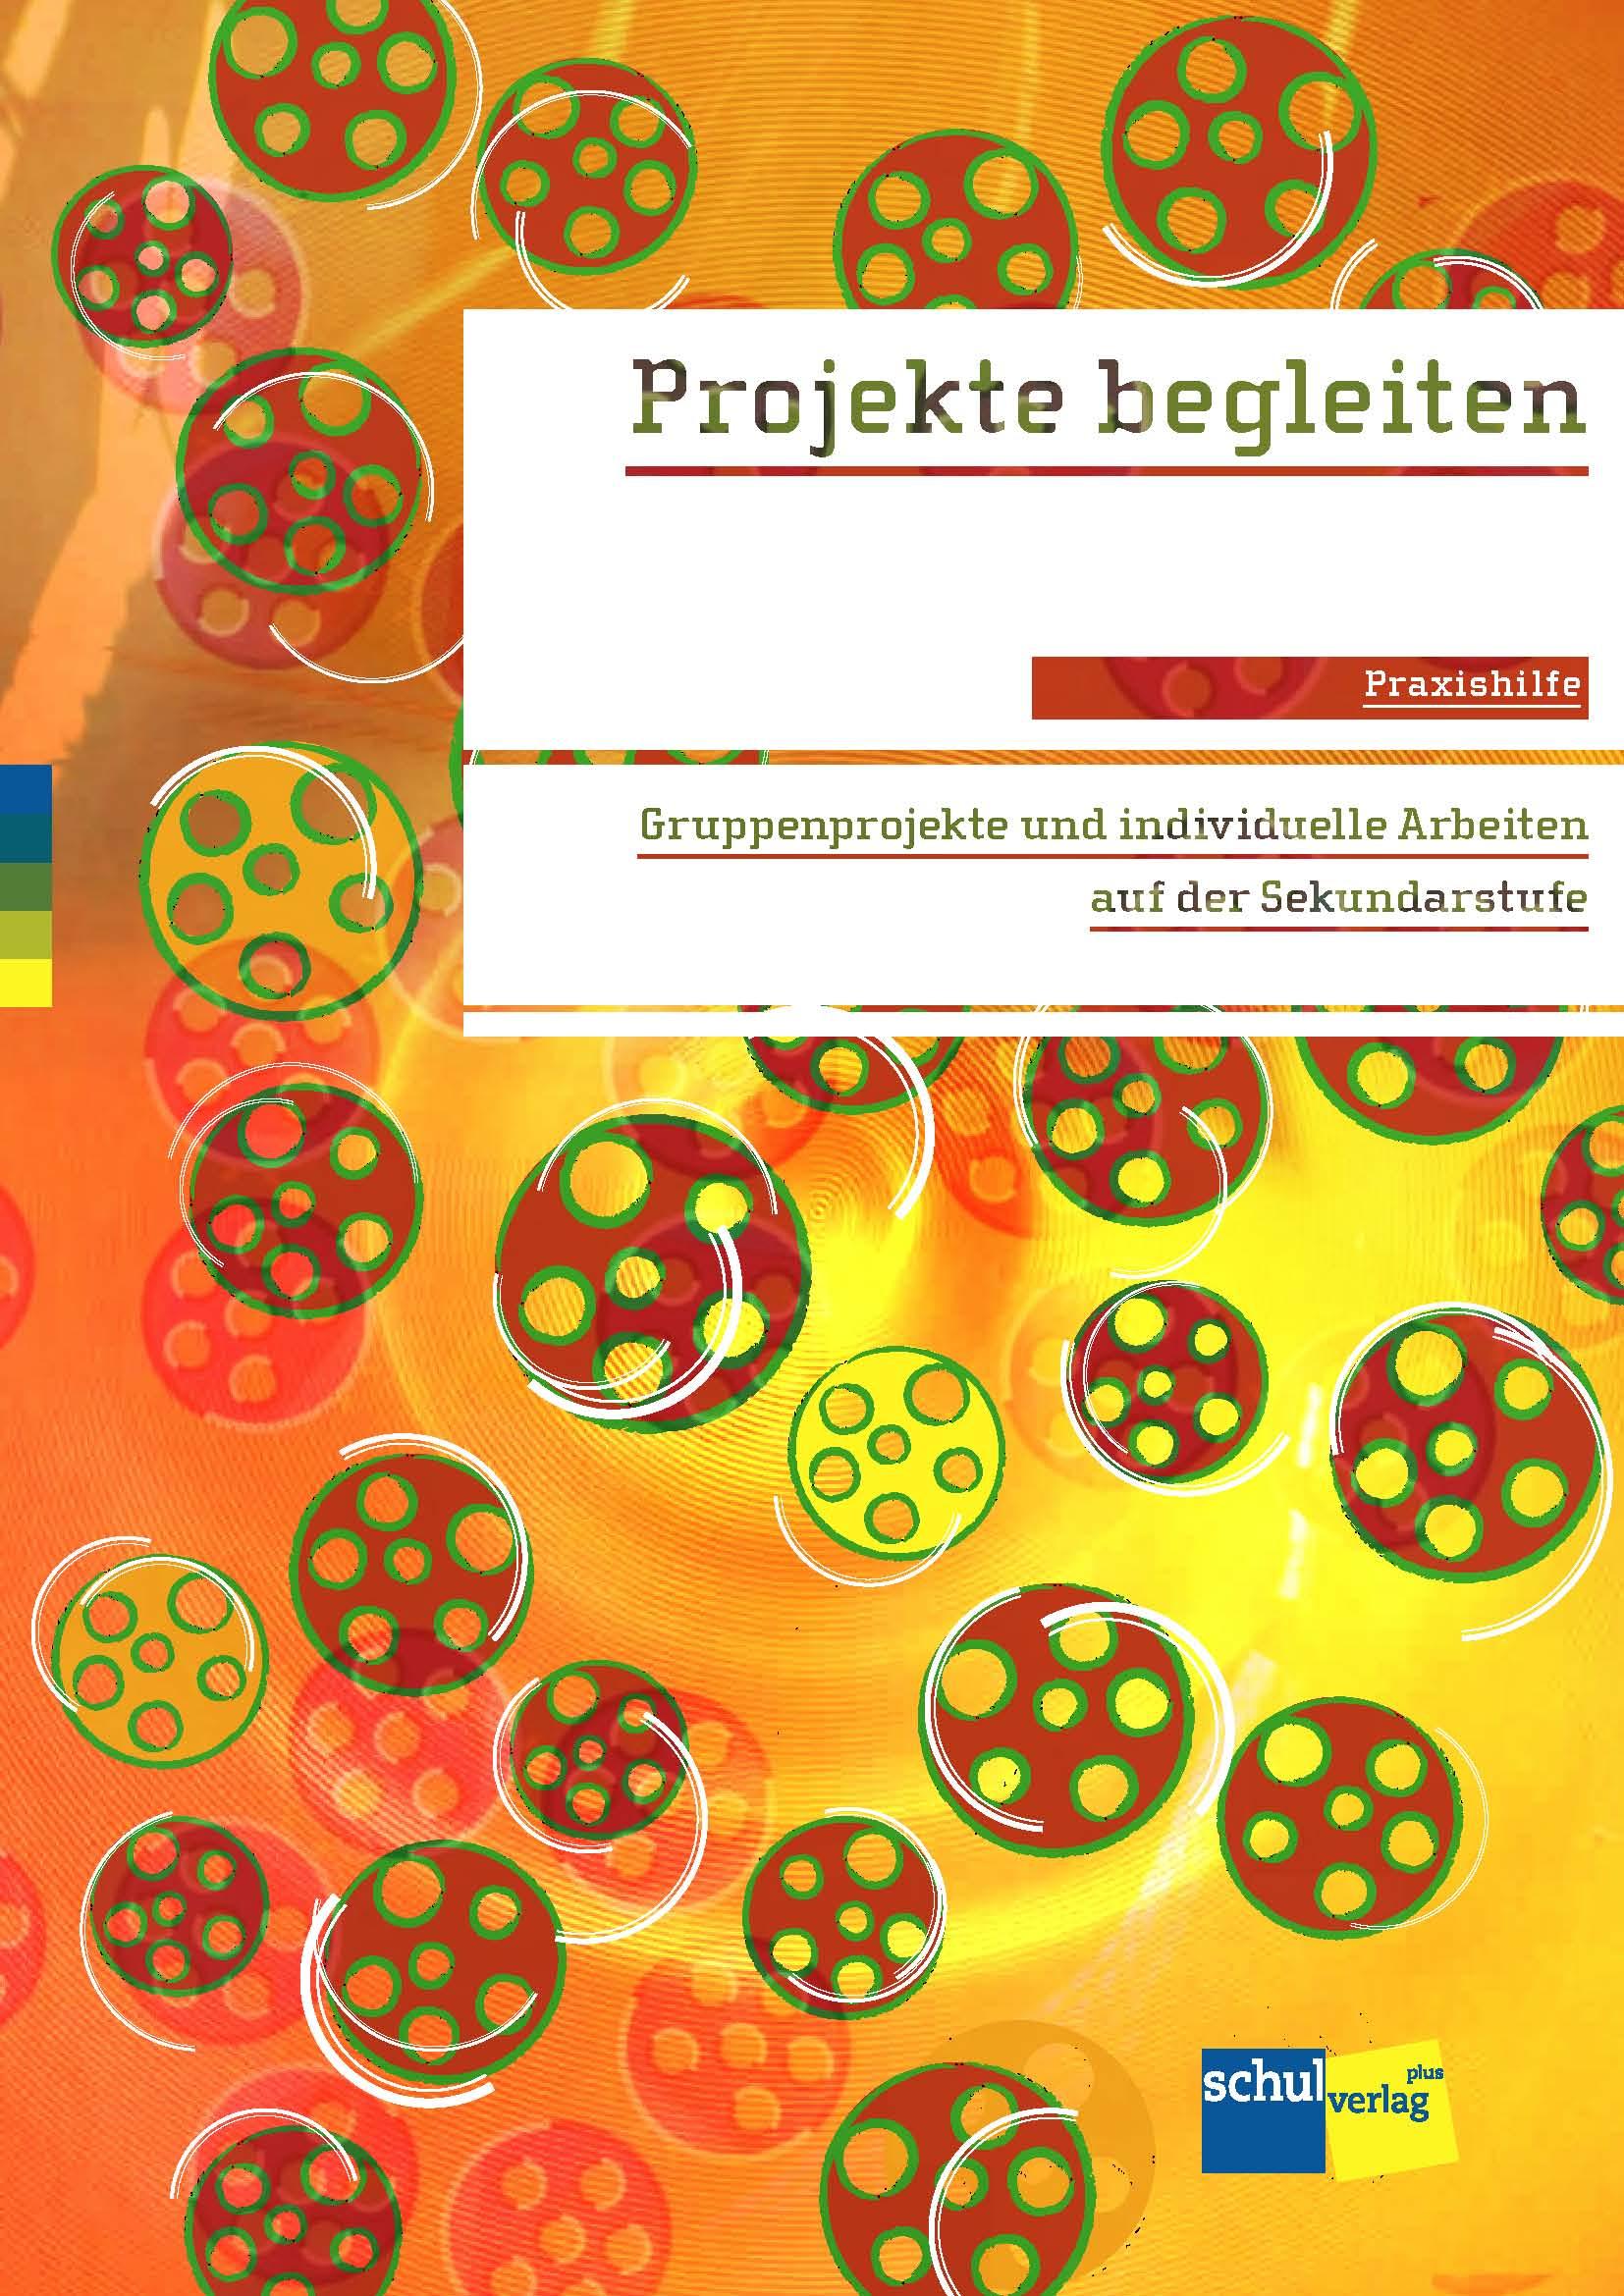 Preview image for LOM object Praxishilfe Projekte begleiten